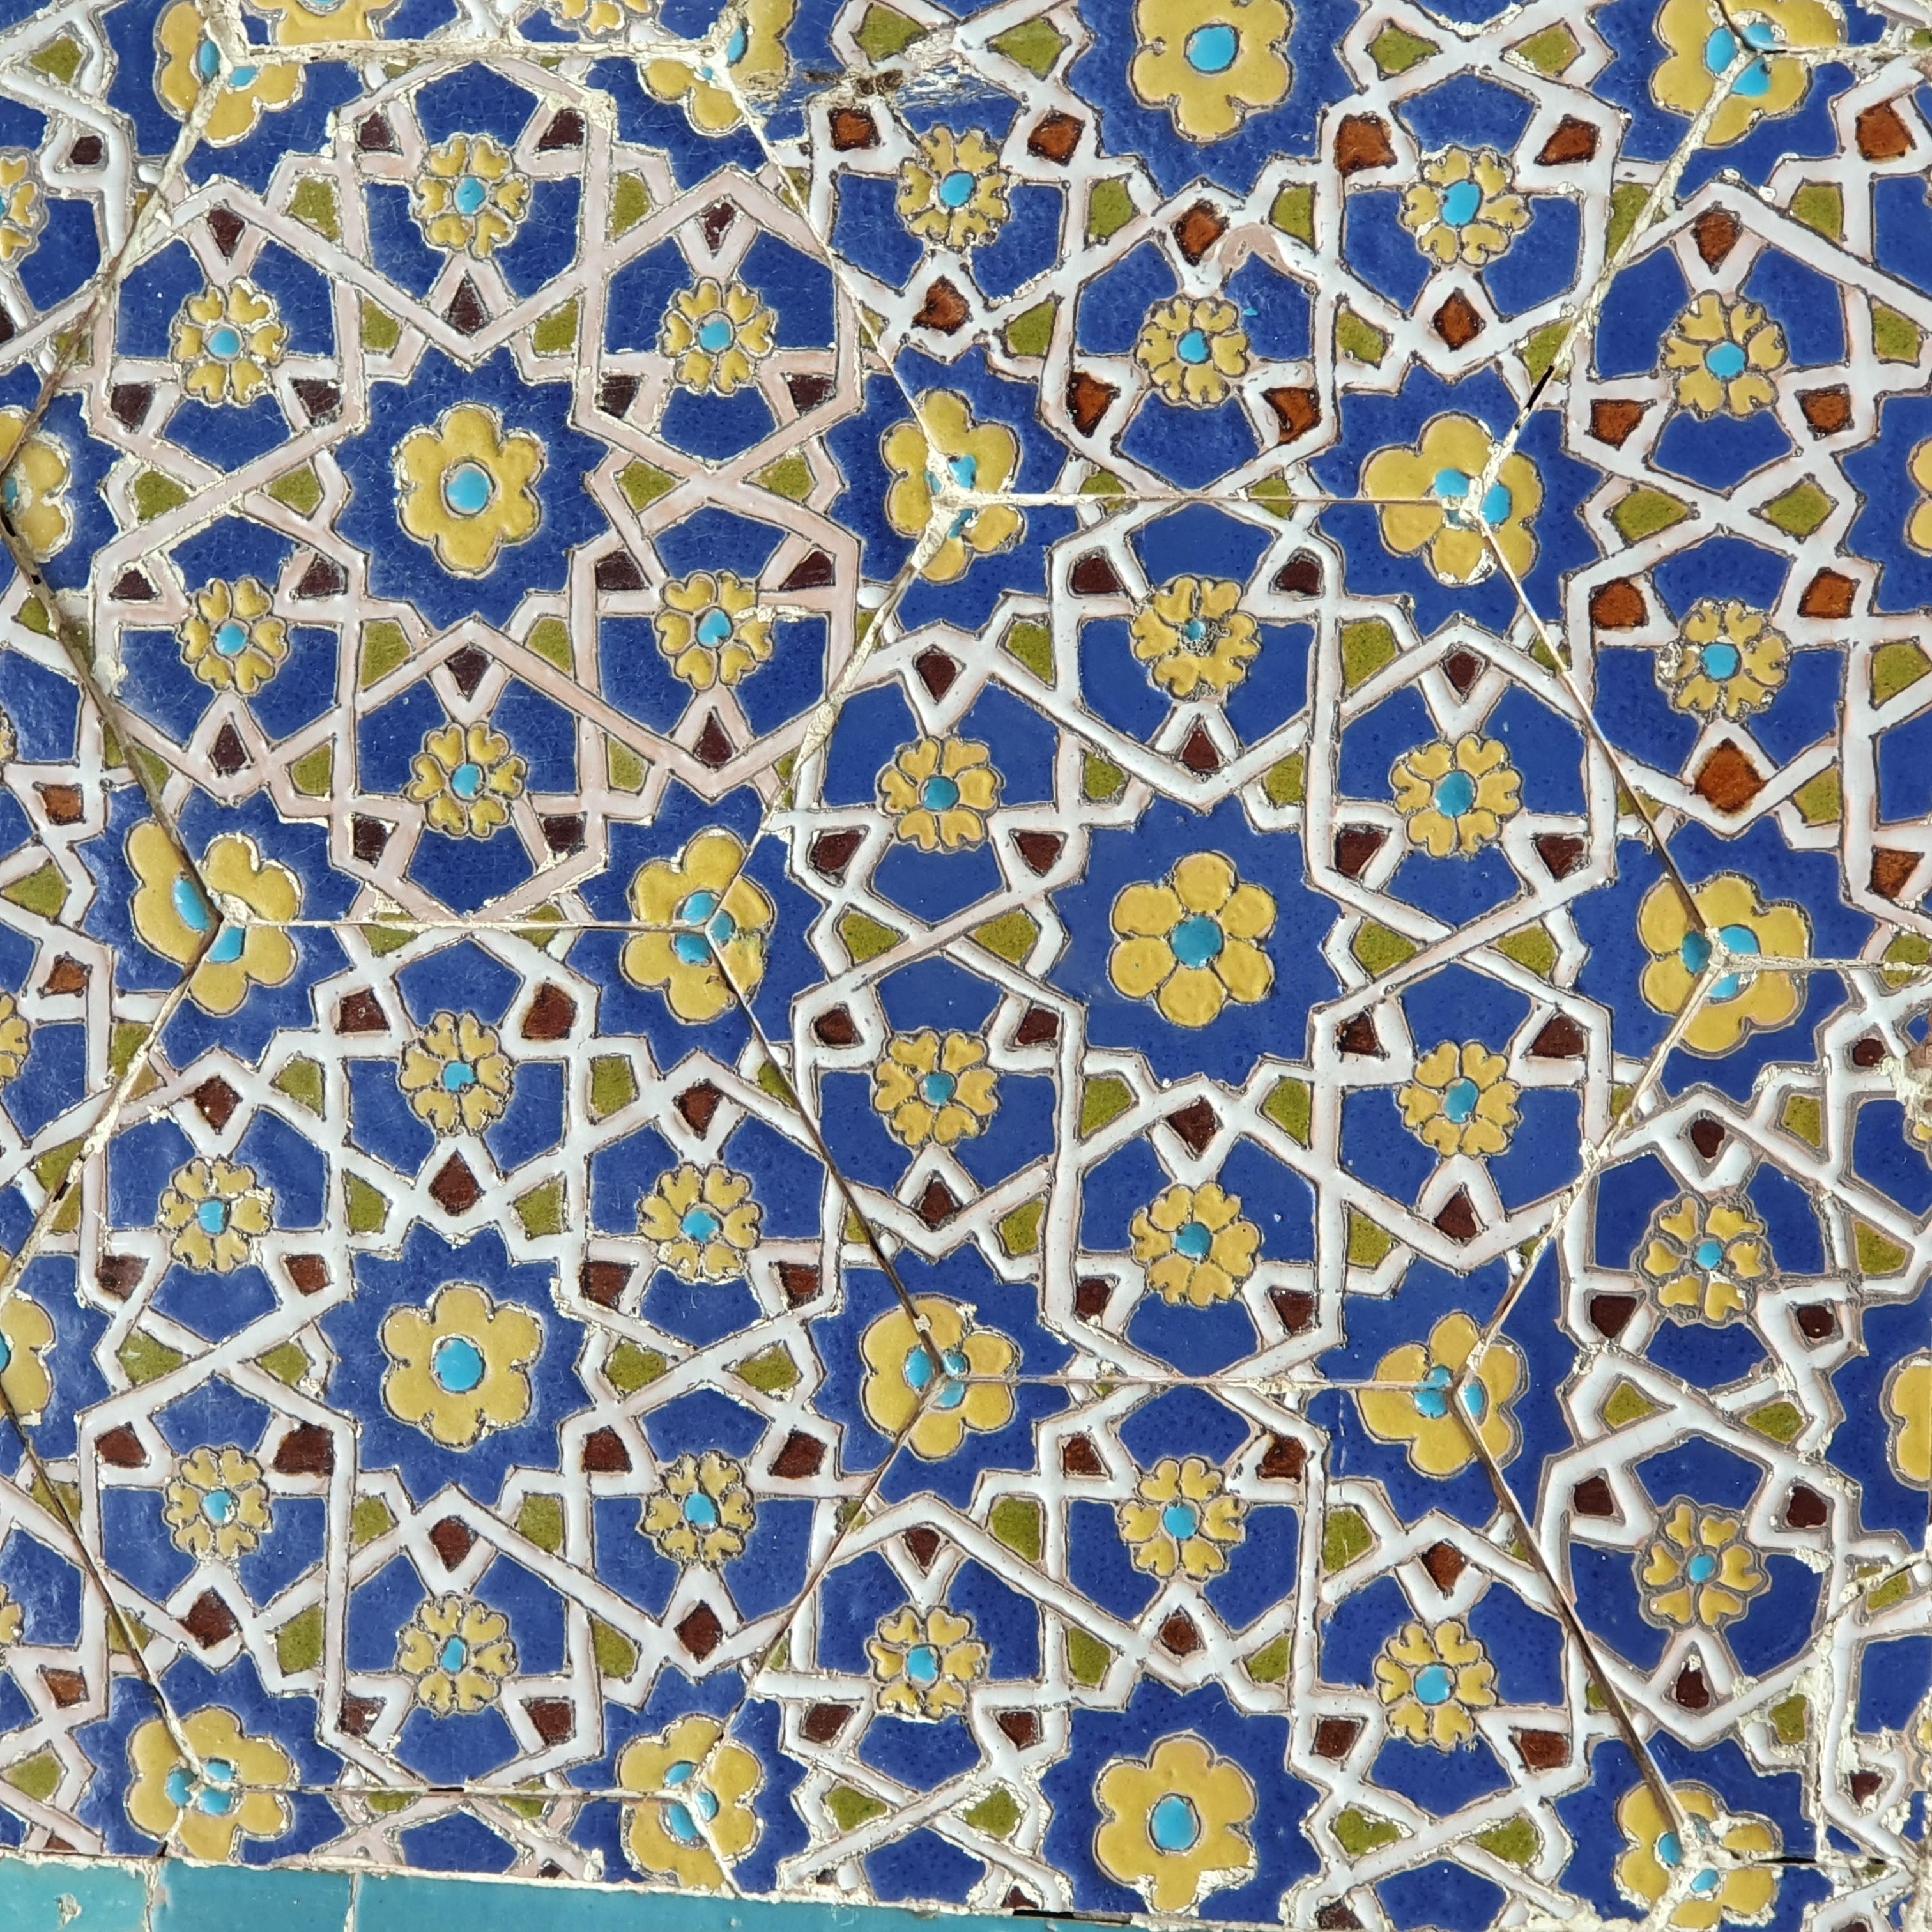 Shohi Zinda mausoleum, Samarkand